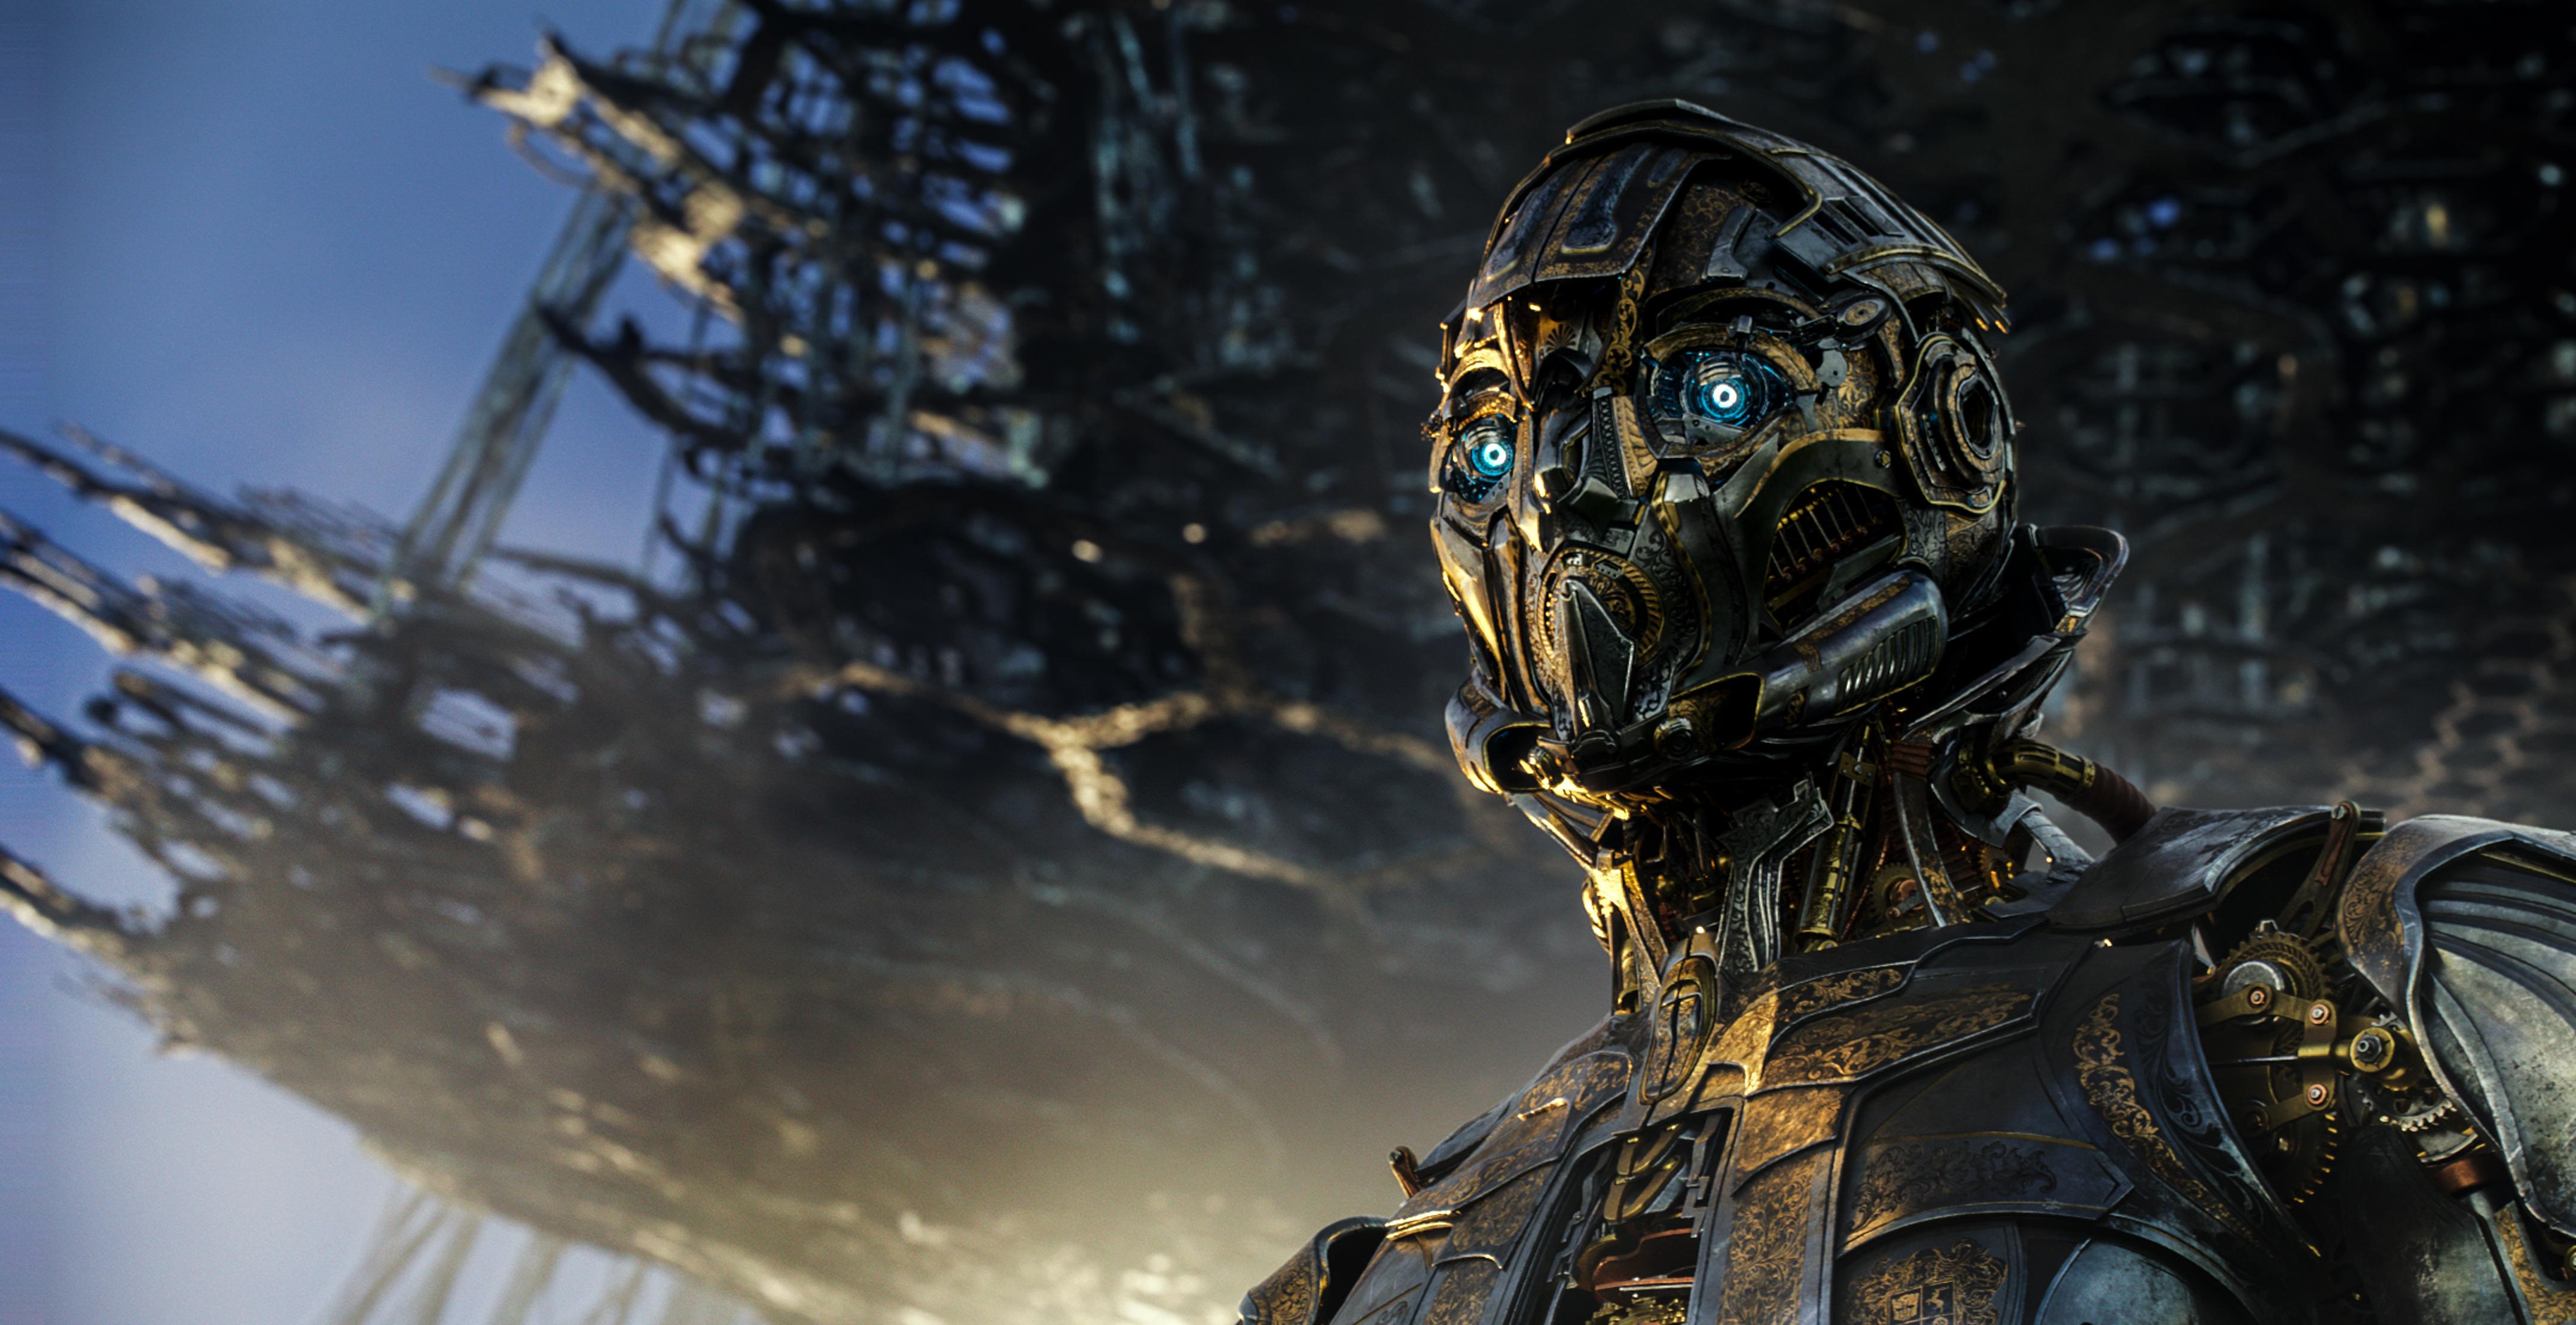 Cogman In Transformers The Last Knight, HD Movies, 4k